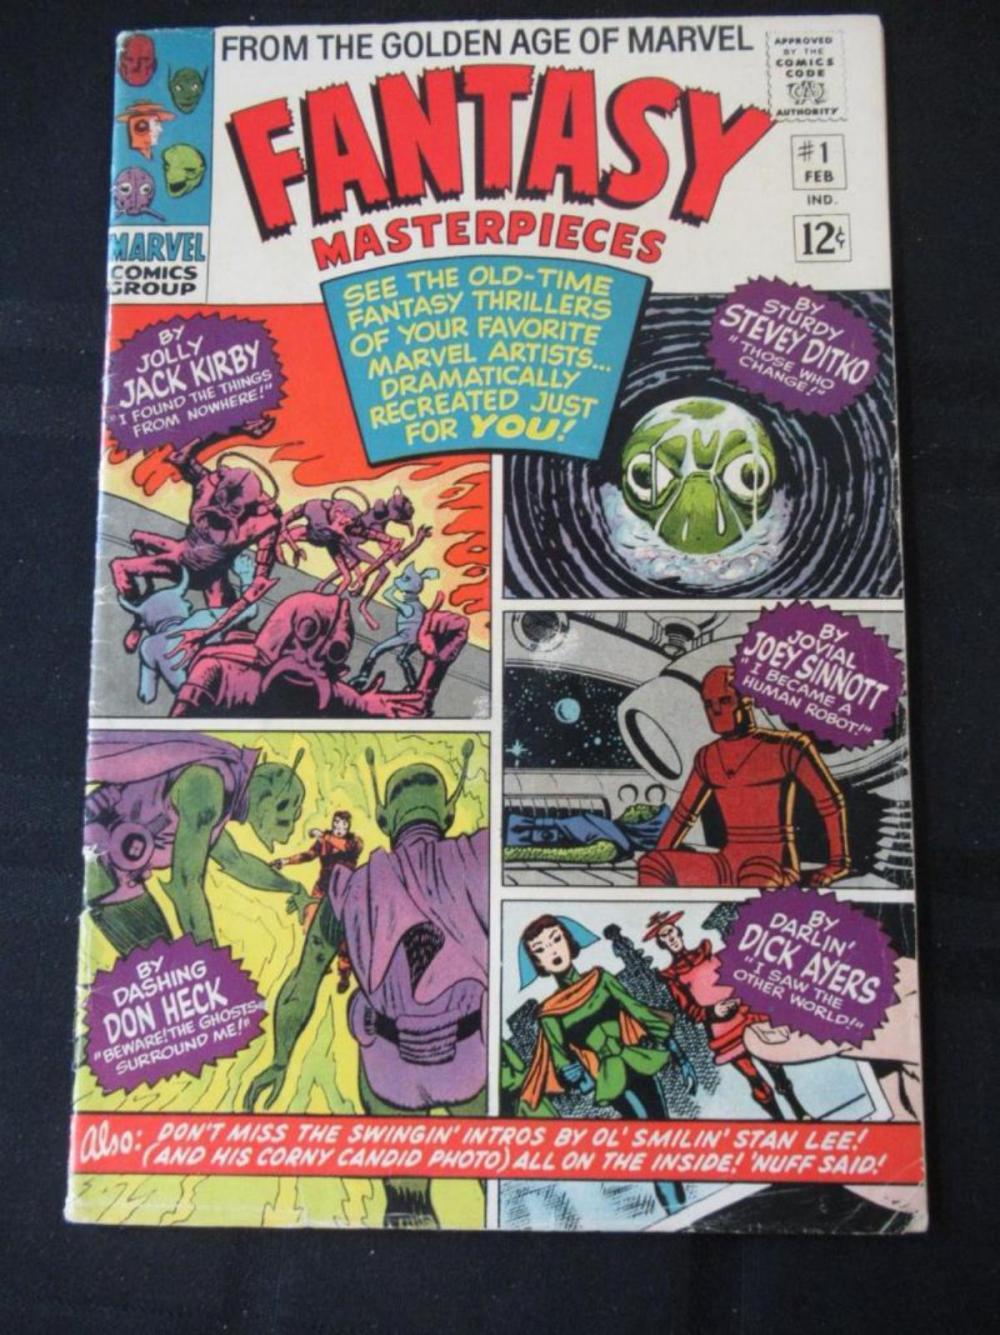 Lot 41: Fantasy Masterpieces 12c #1 intro by Stan Lee